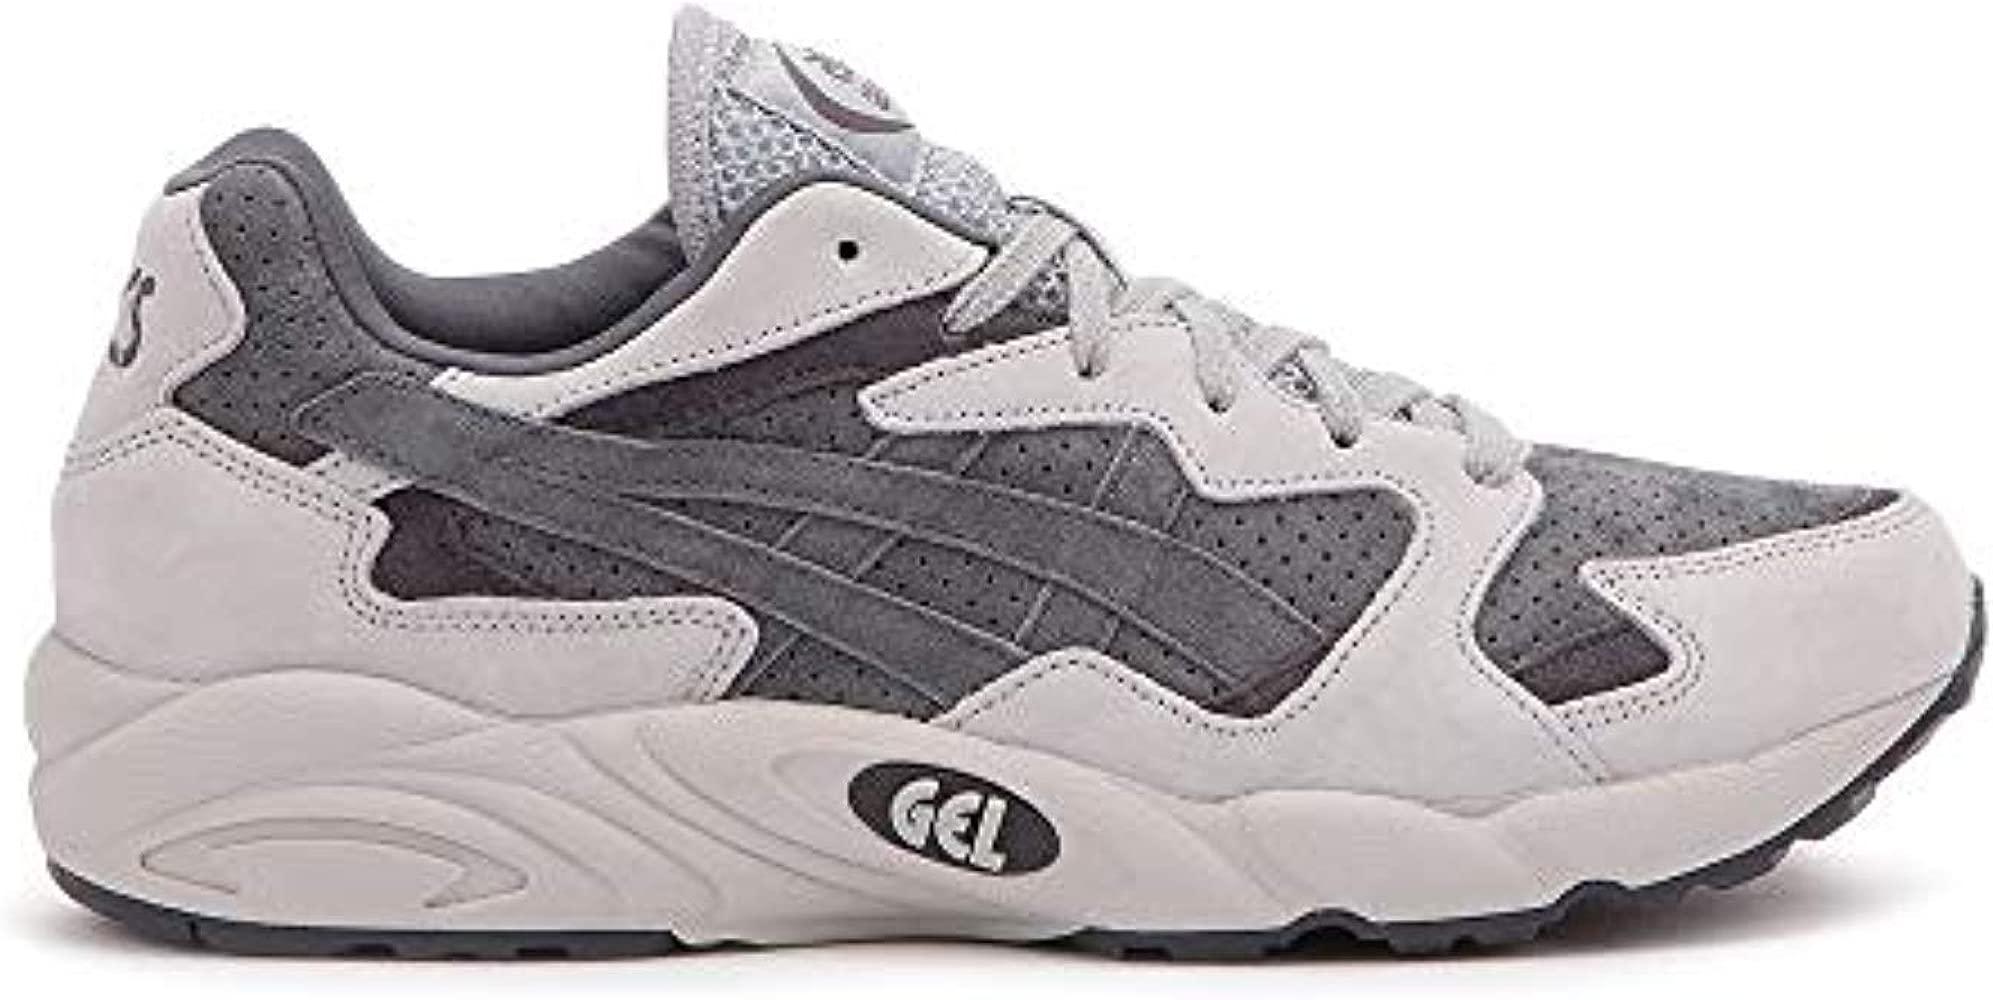 zapatillas asics hombres grises